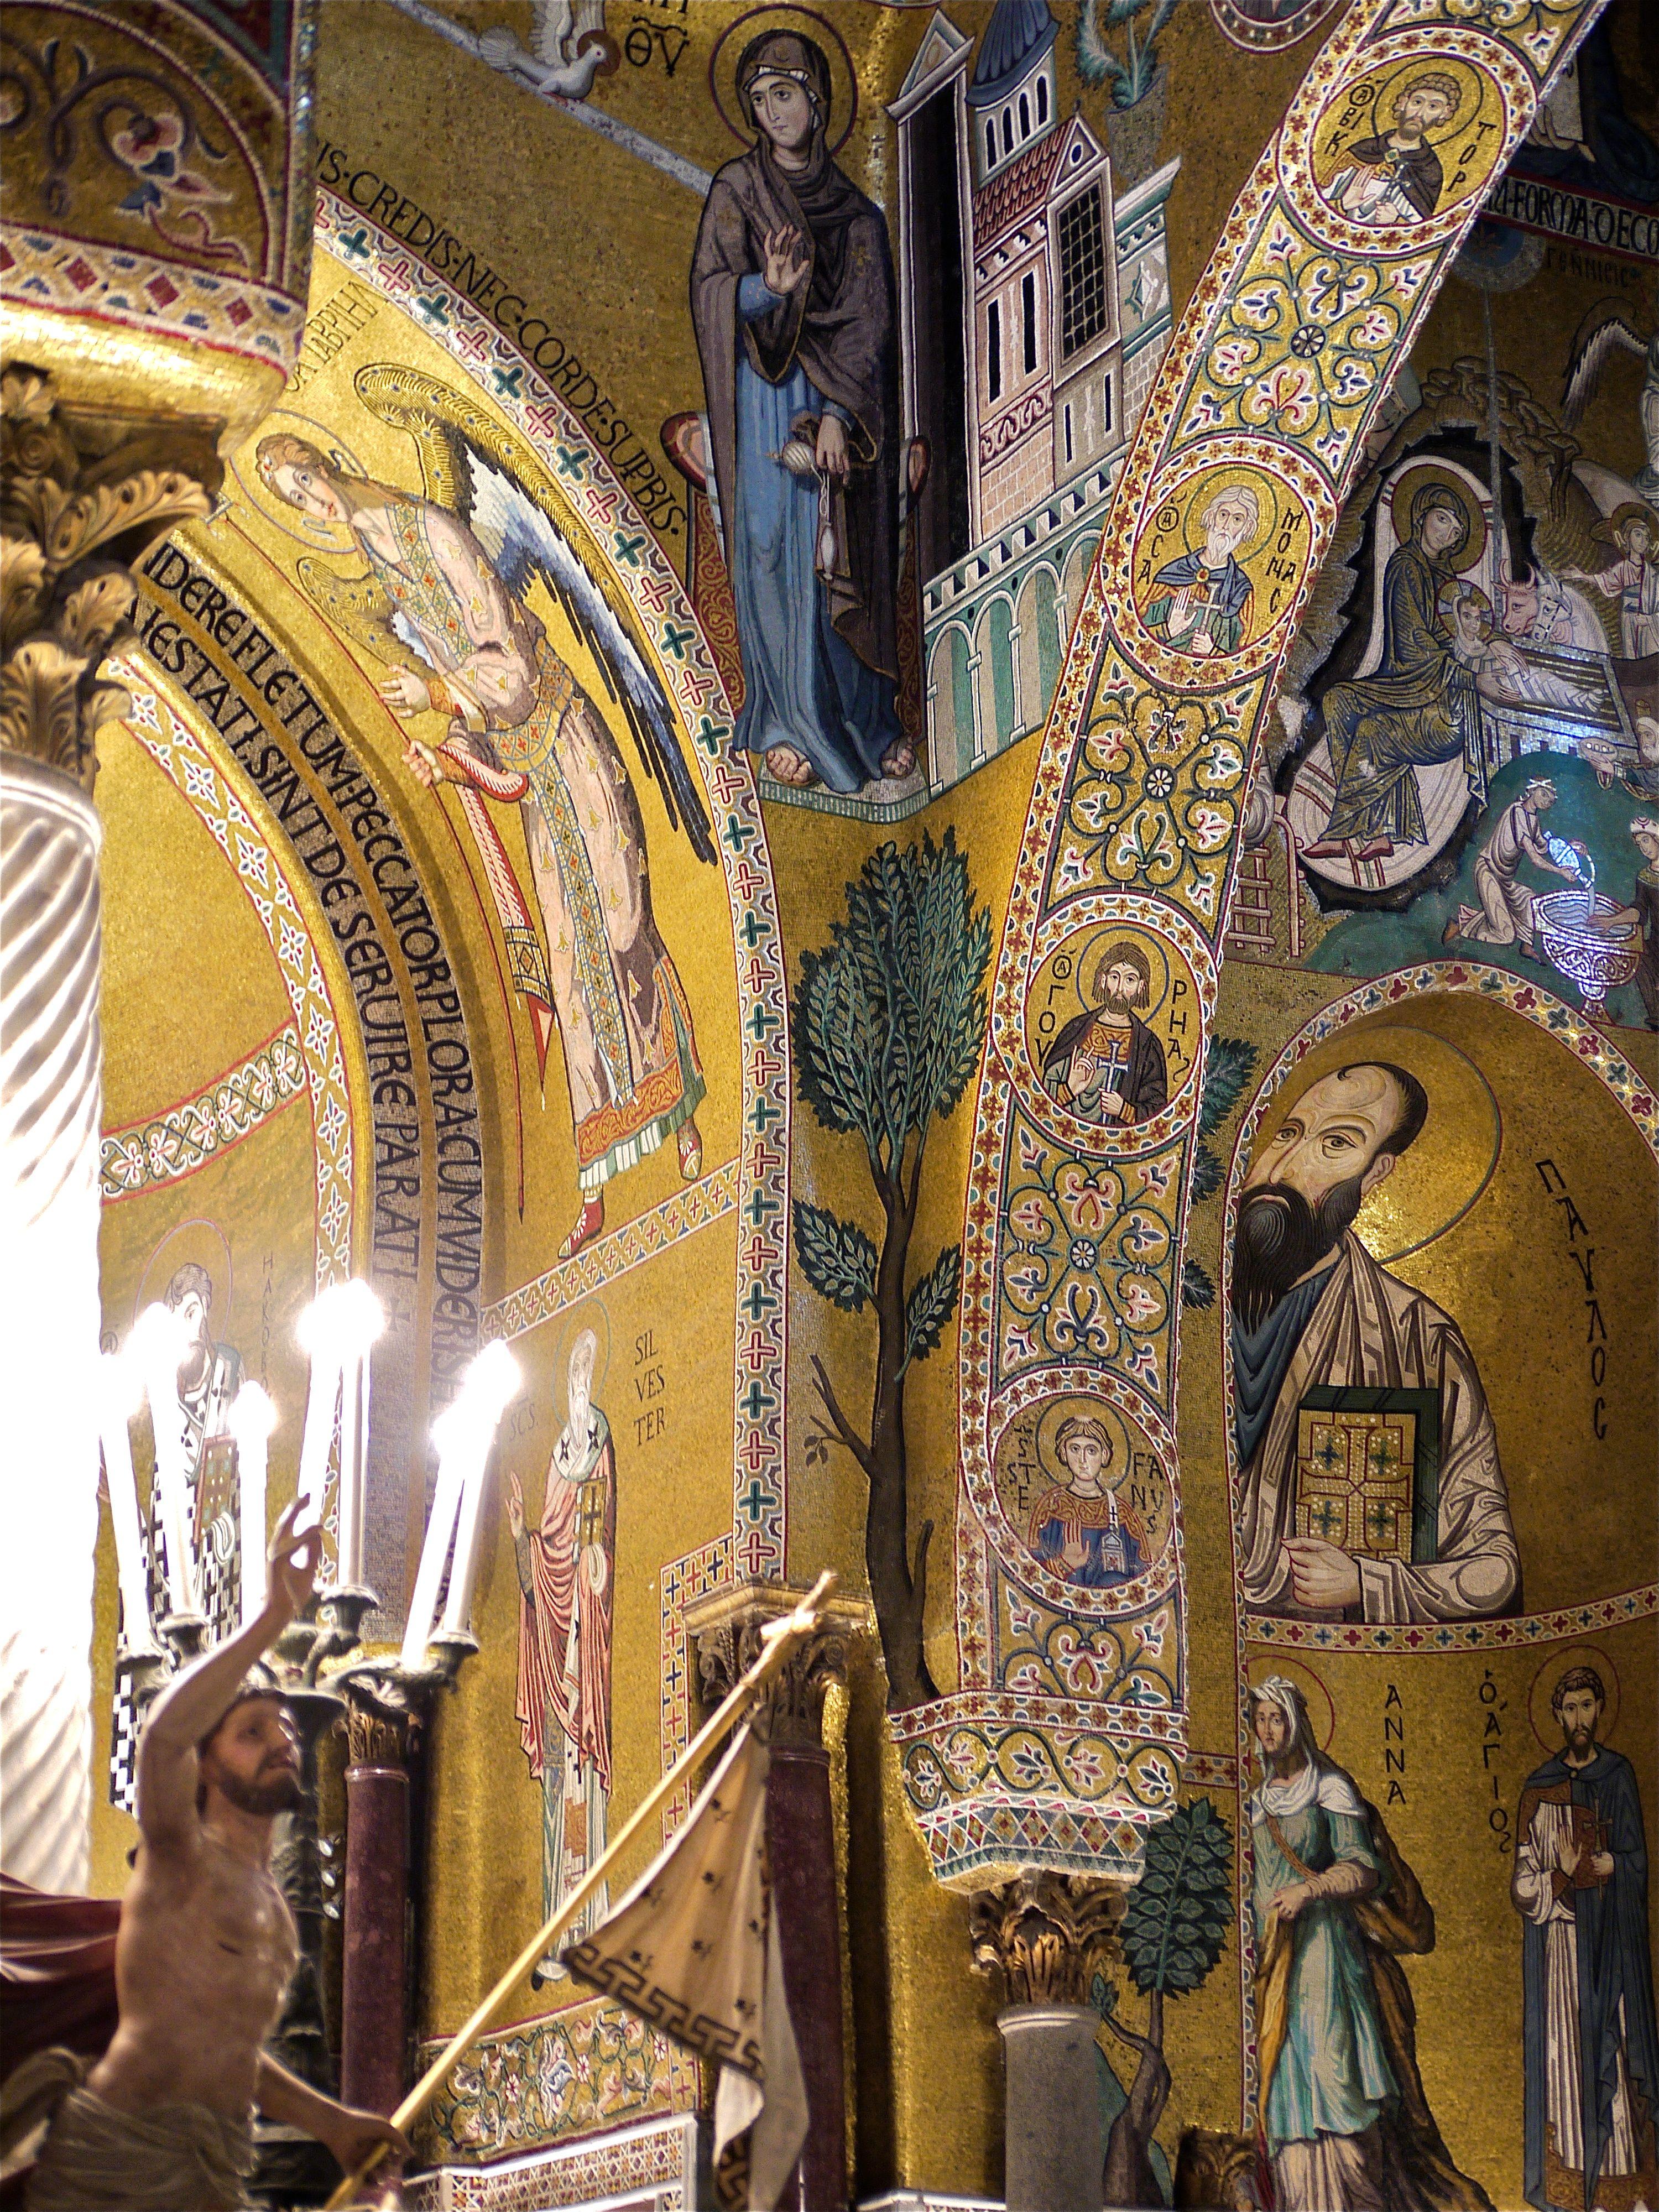 AFAR.com Highlight: Marvellous mosaics by Deidre Rowe I Flashbulb Moments